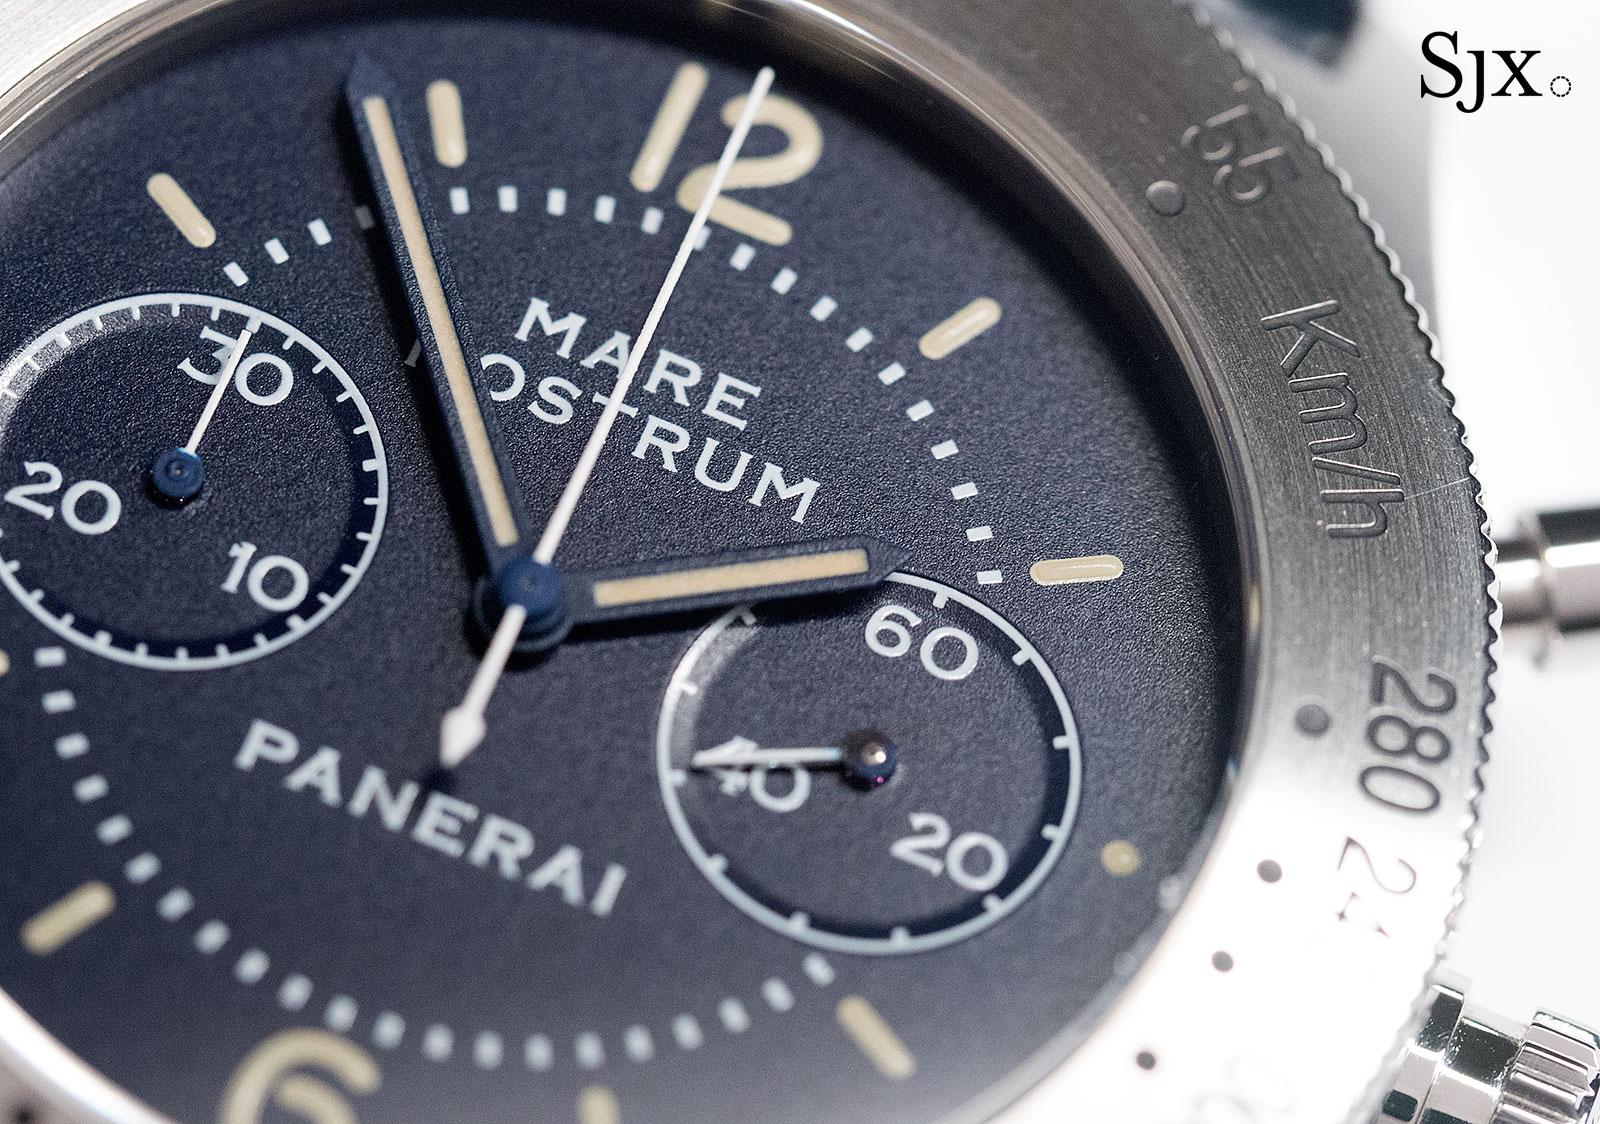 Panerai Mare Nostrum PAM 716 chrono 6